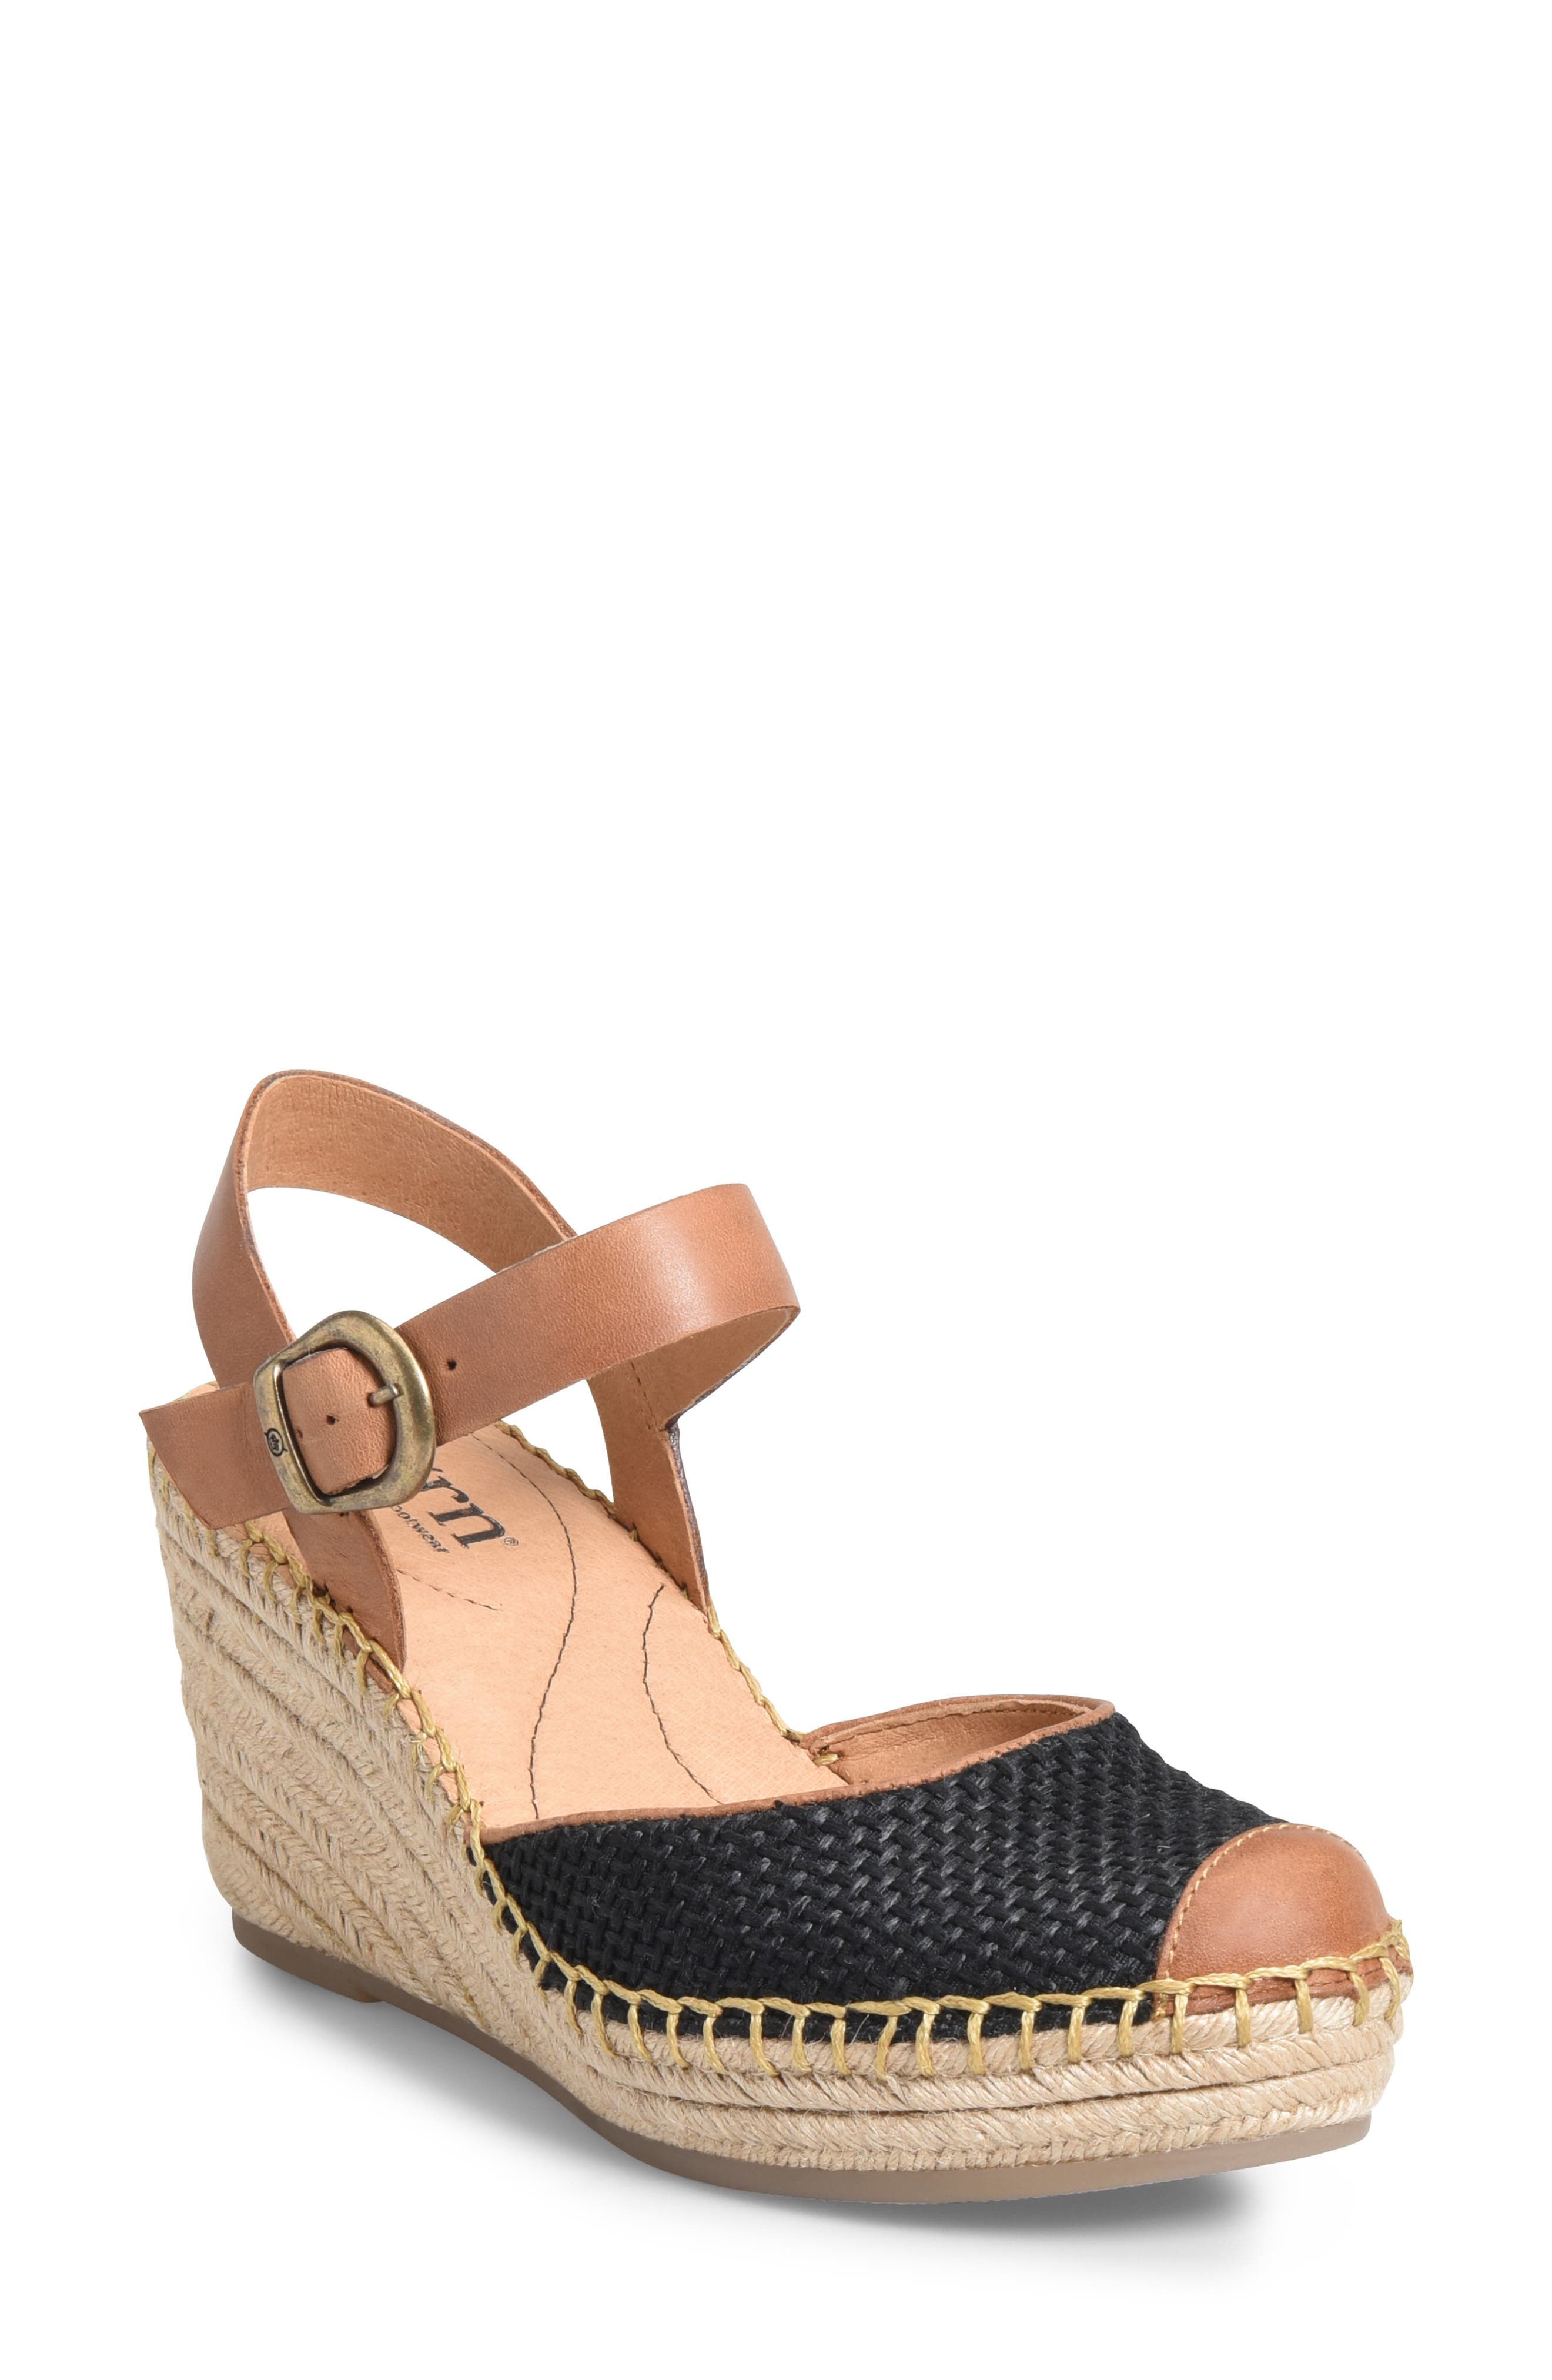 Guadalupe Wedge Sandal, Main, color, BLACK/ RUST FABRIC